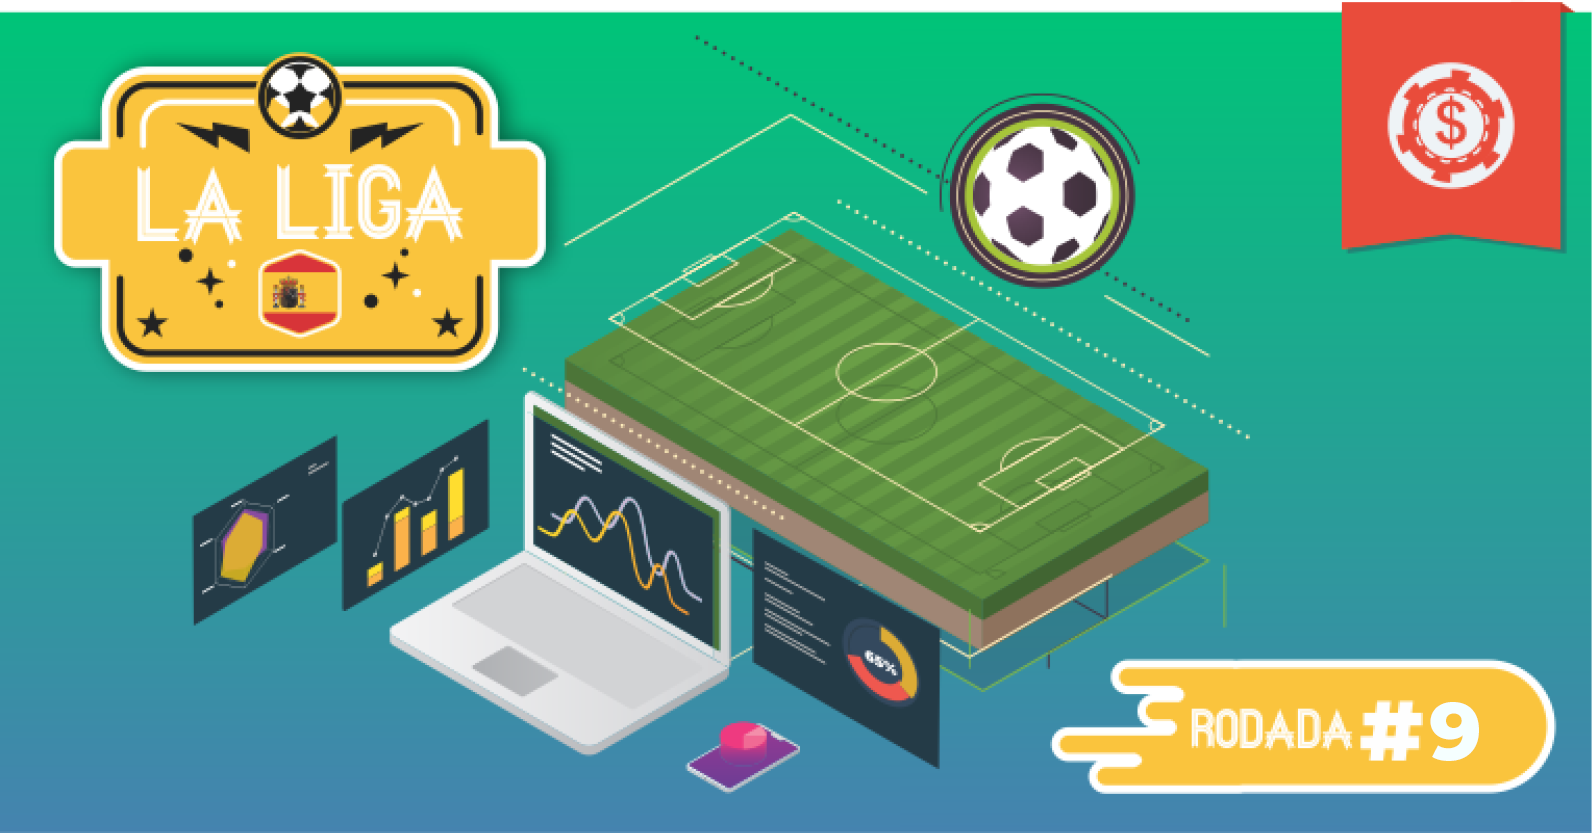 Prognósticos La Liga - Campeonato Espanhol • Apostas para a 9ª rodada 7374a4787044a